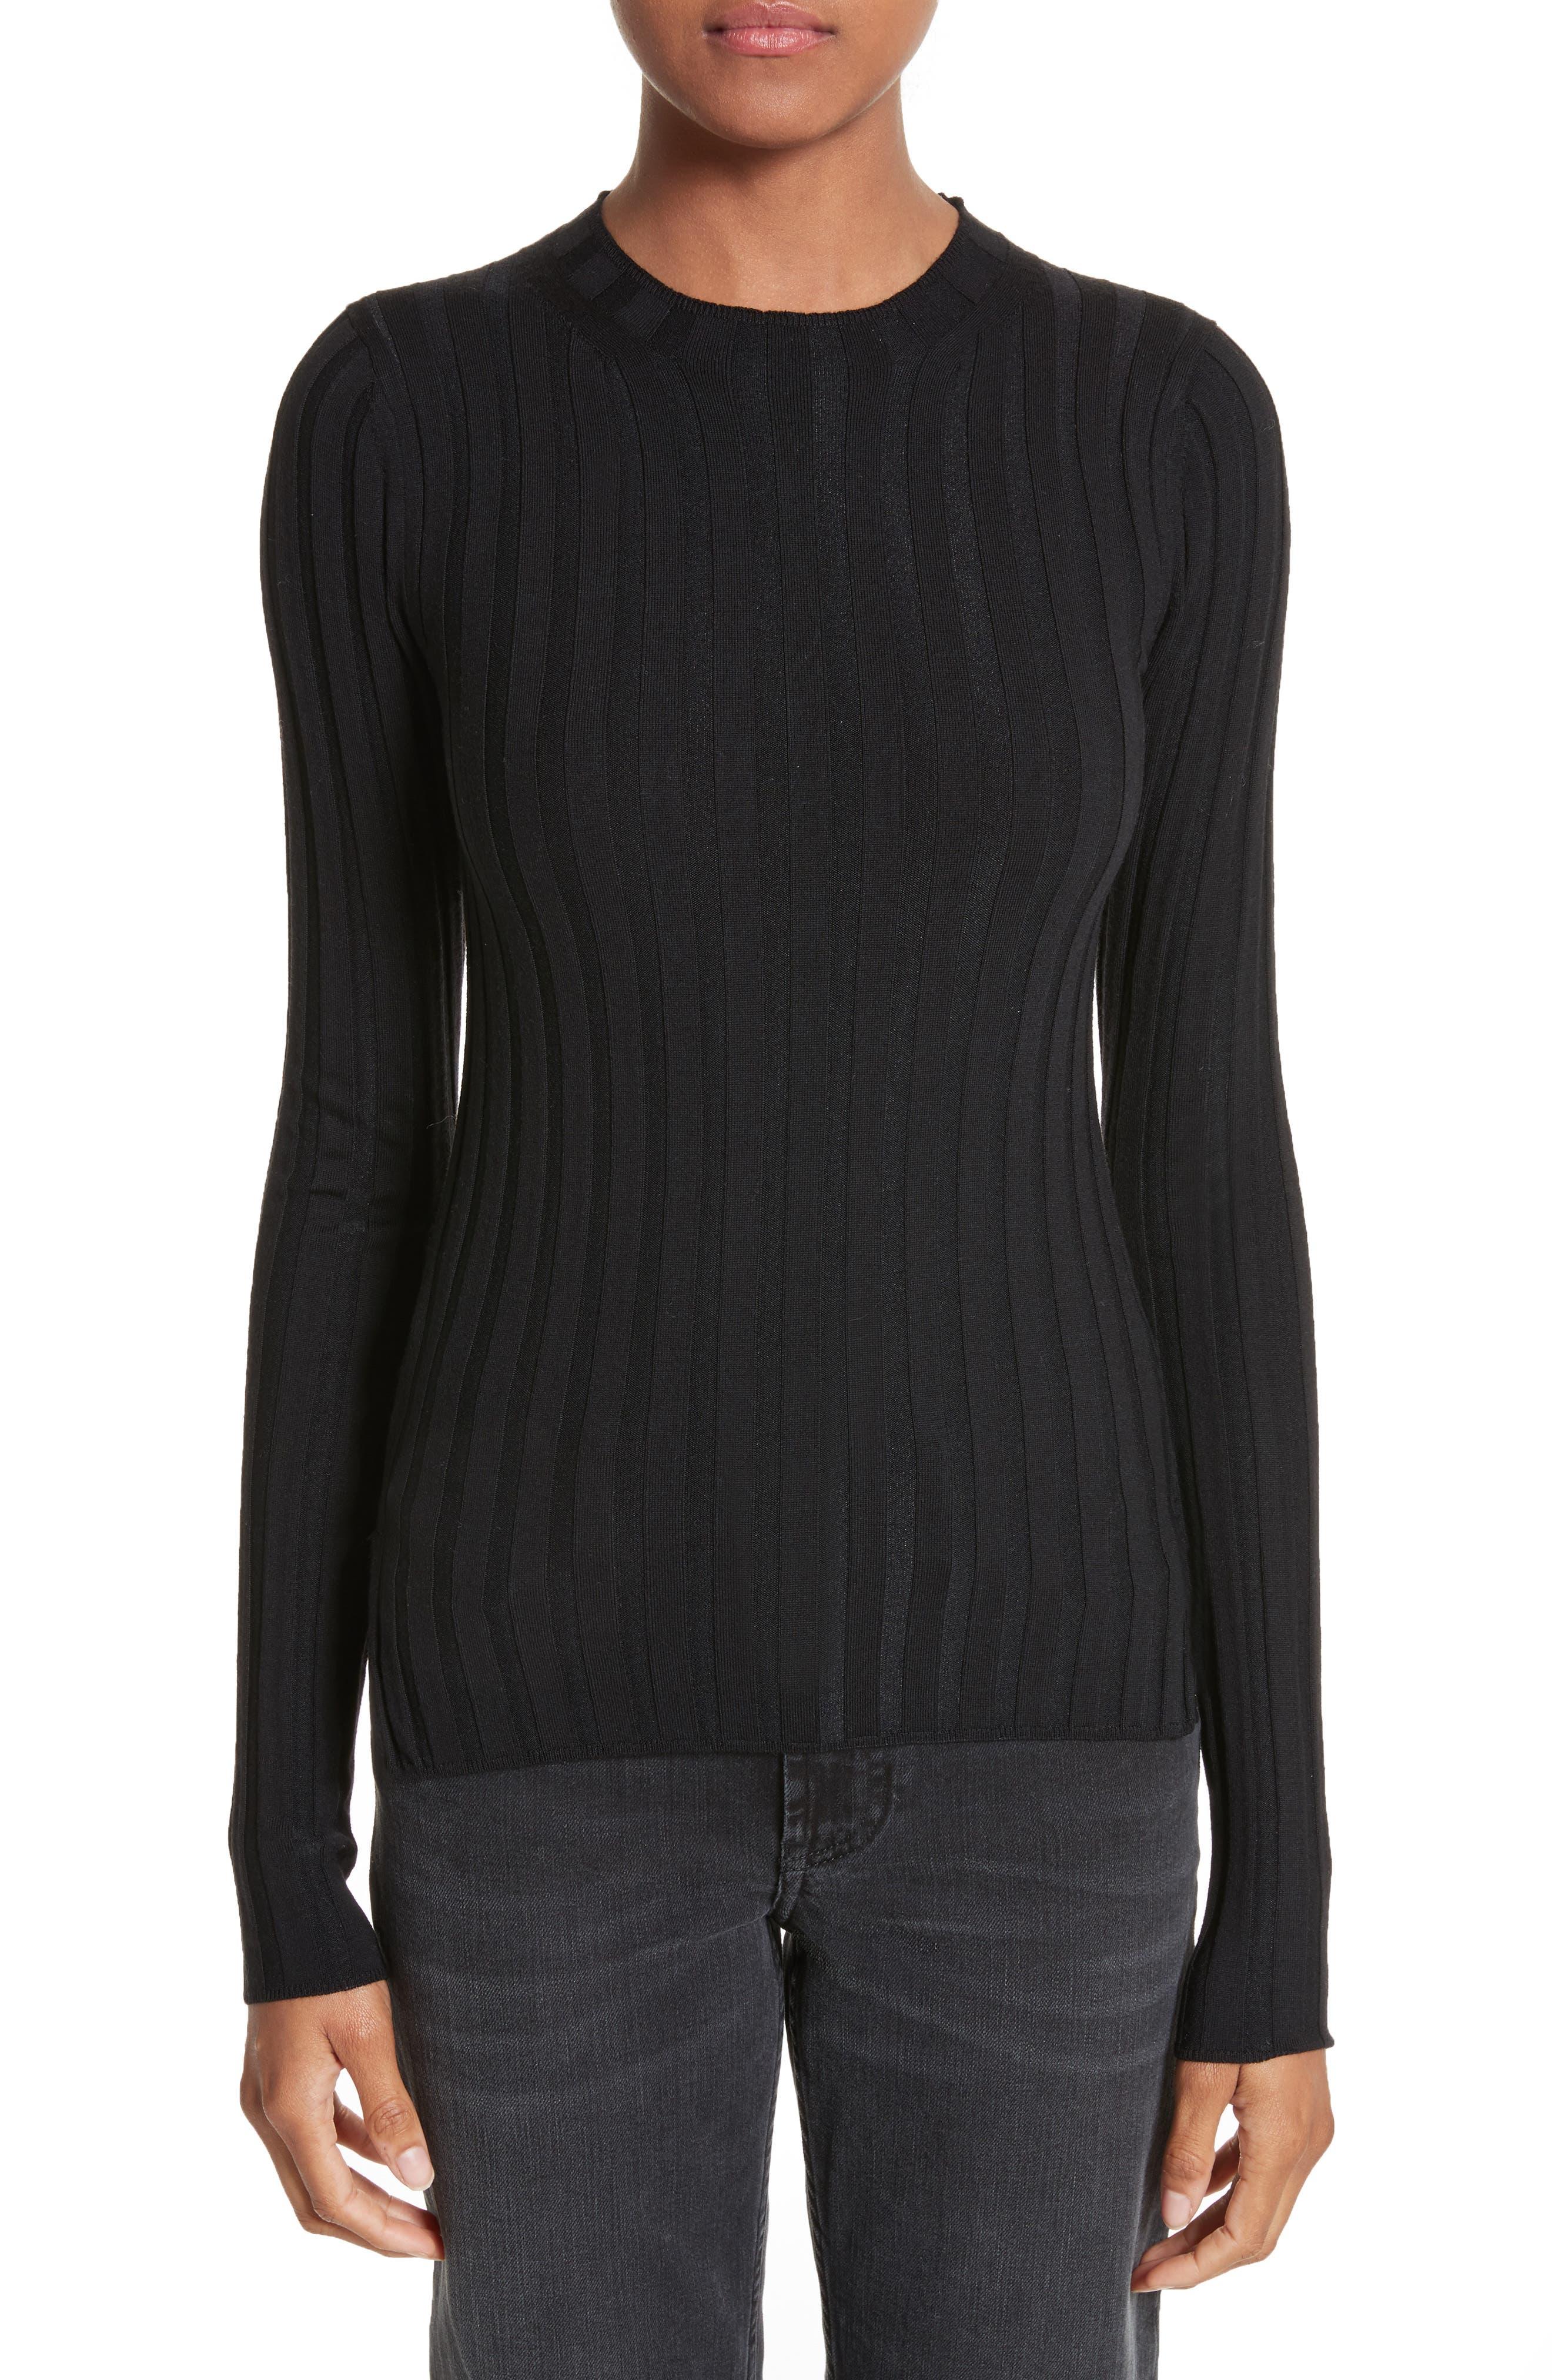 Alternate Image 1 Selected - ACNE Studios Carina Fitted Crewneck Sweater